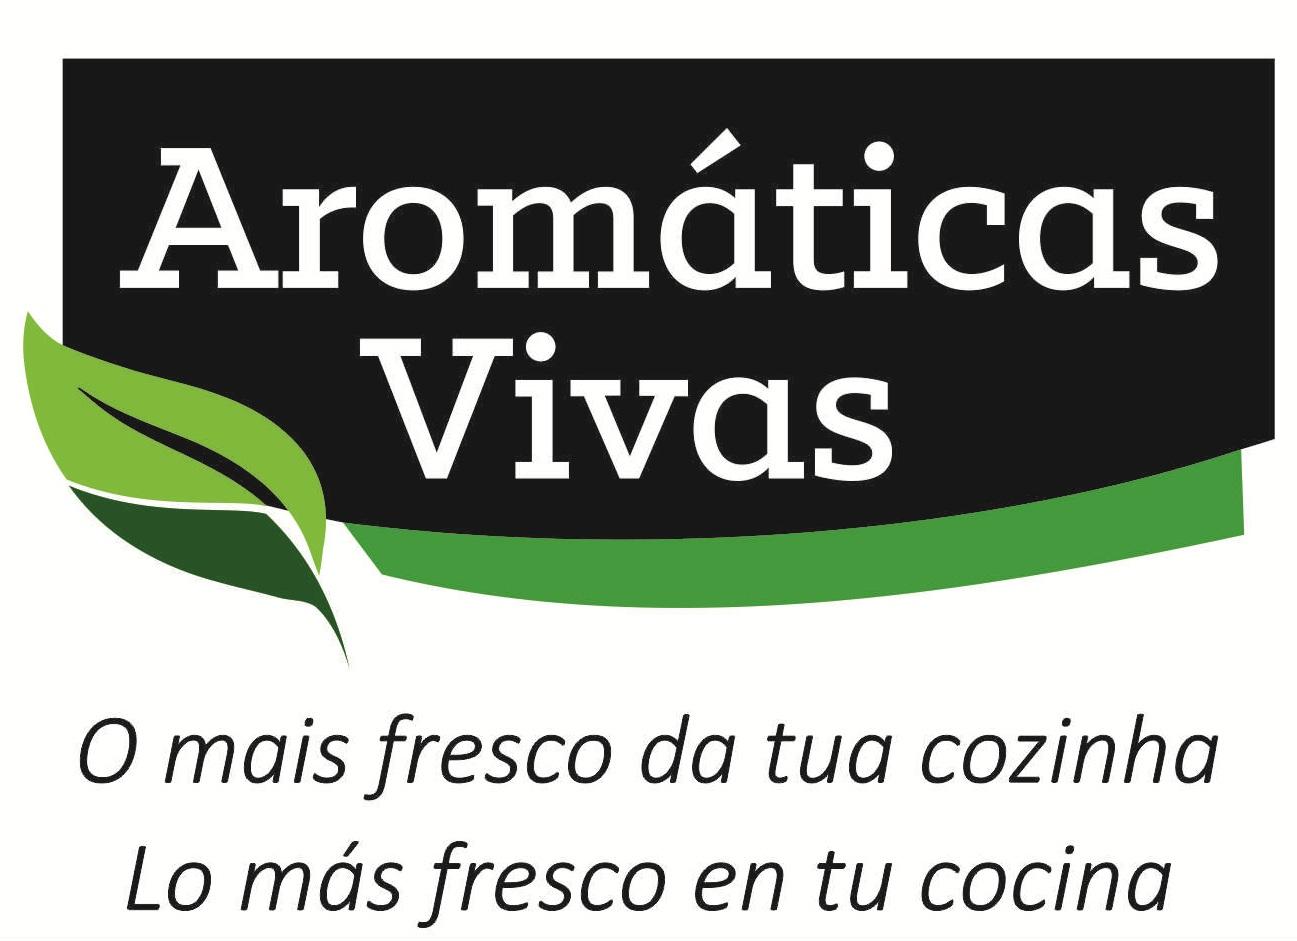 slogan nas duas línguas 07 2015